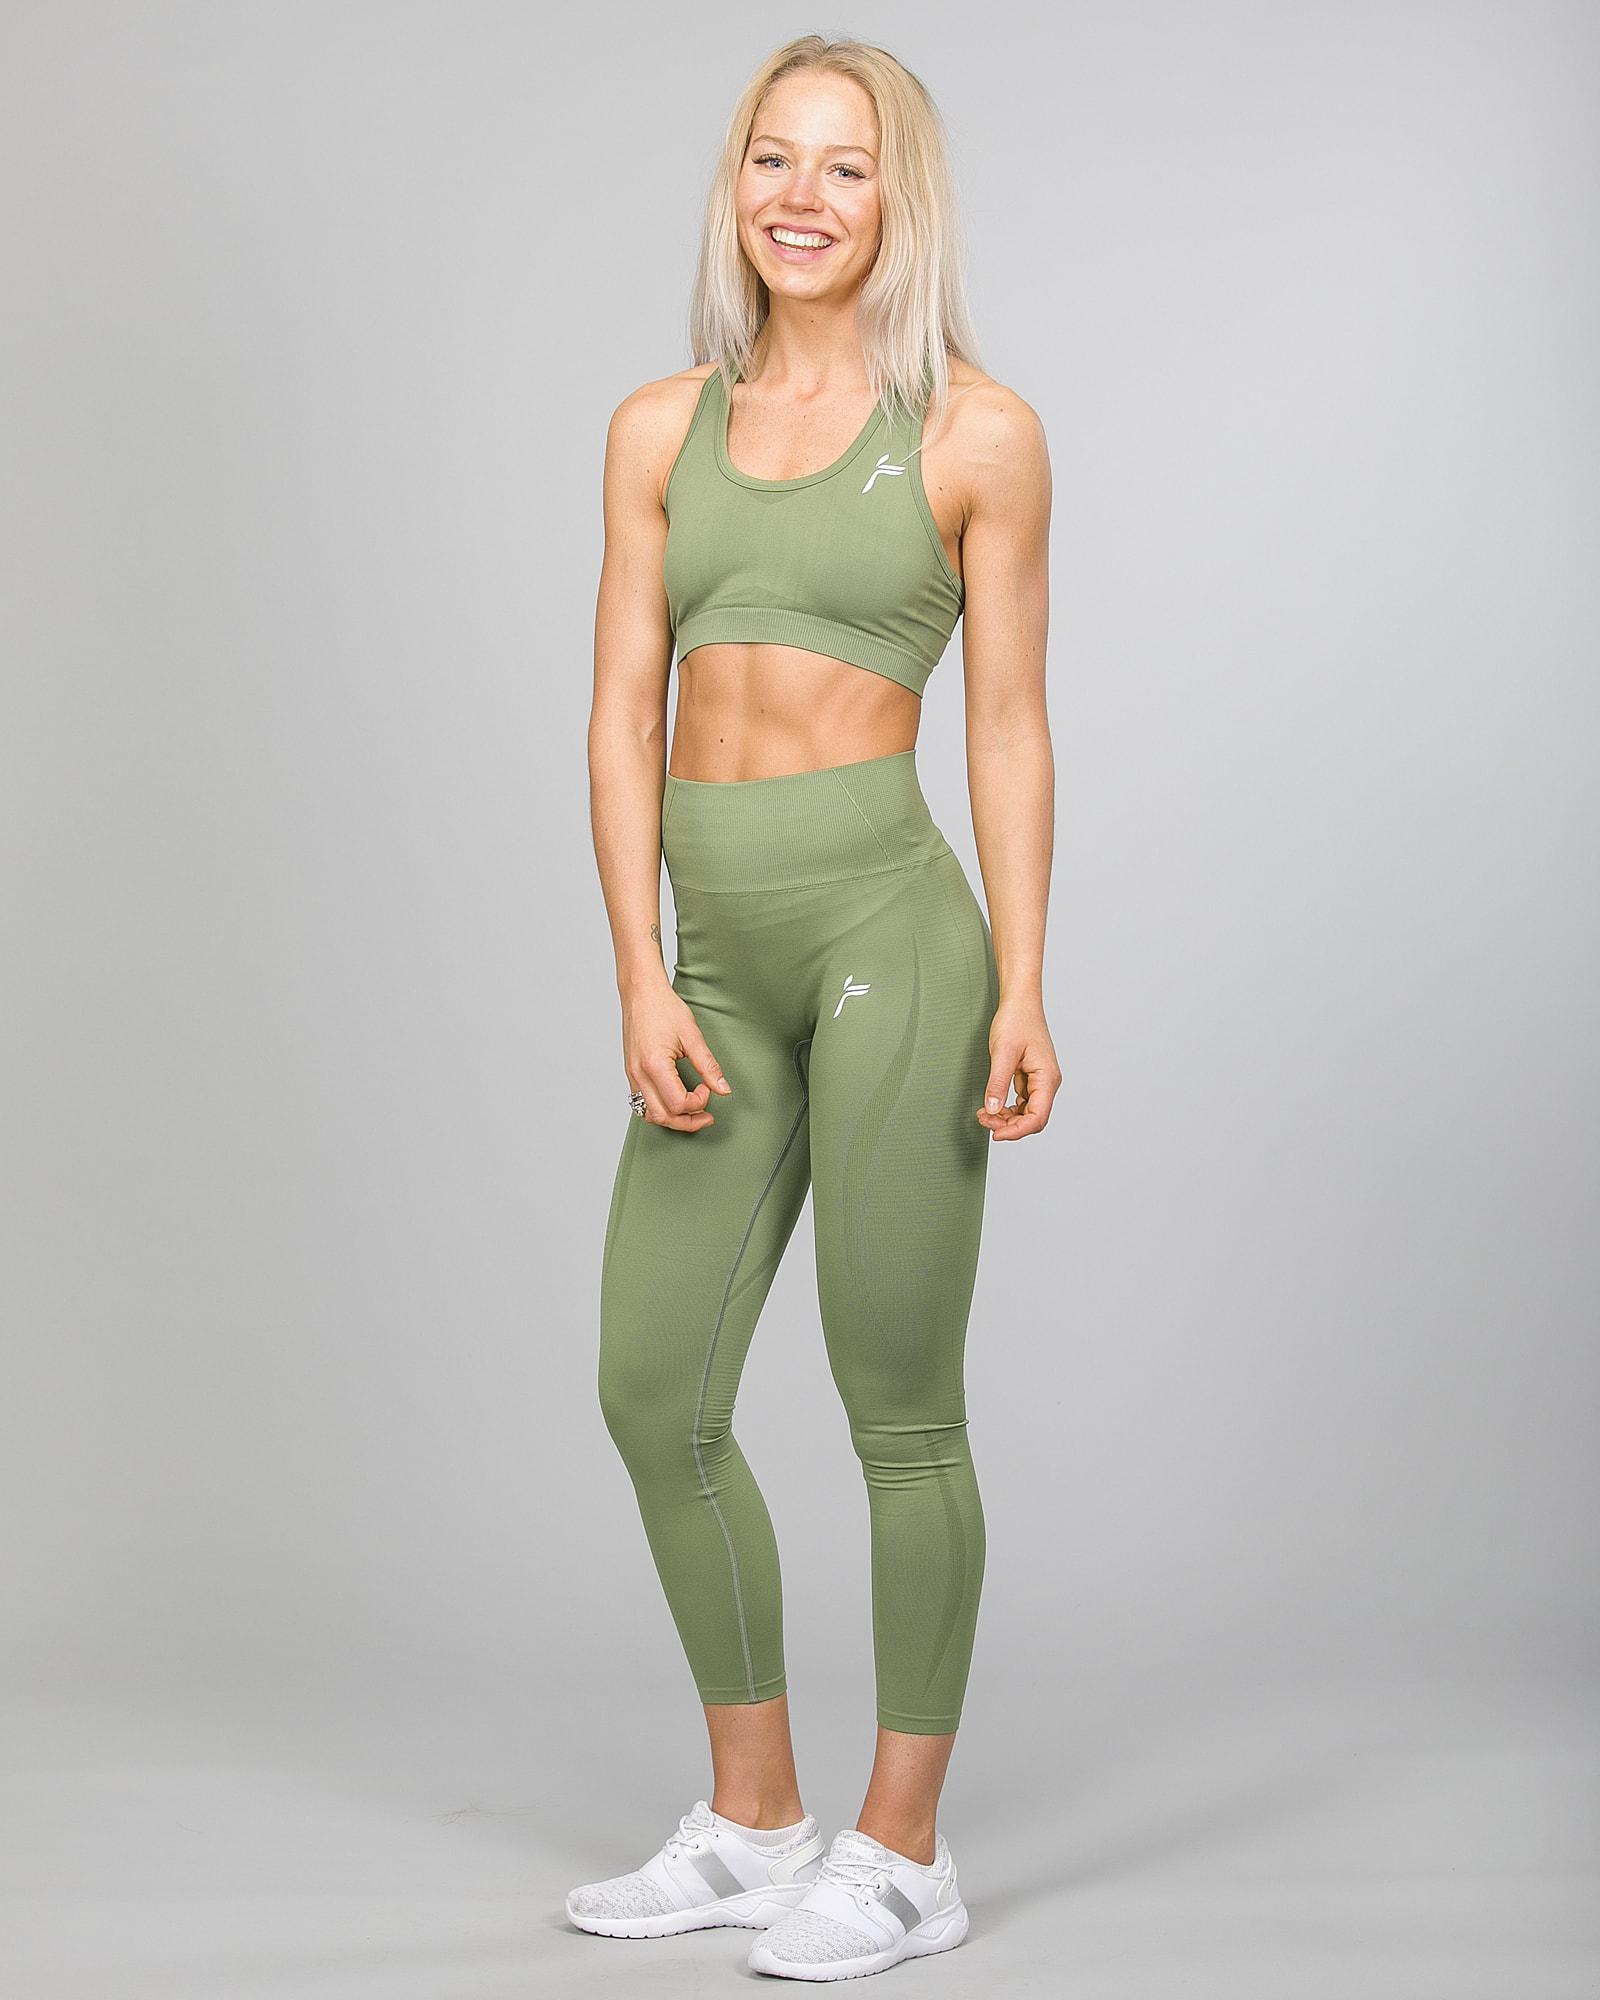 Famme Vortex Legging vhwl-ag and Drop It Sports Bra disb-ag Army Green c